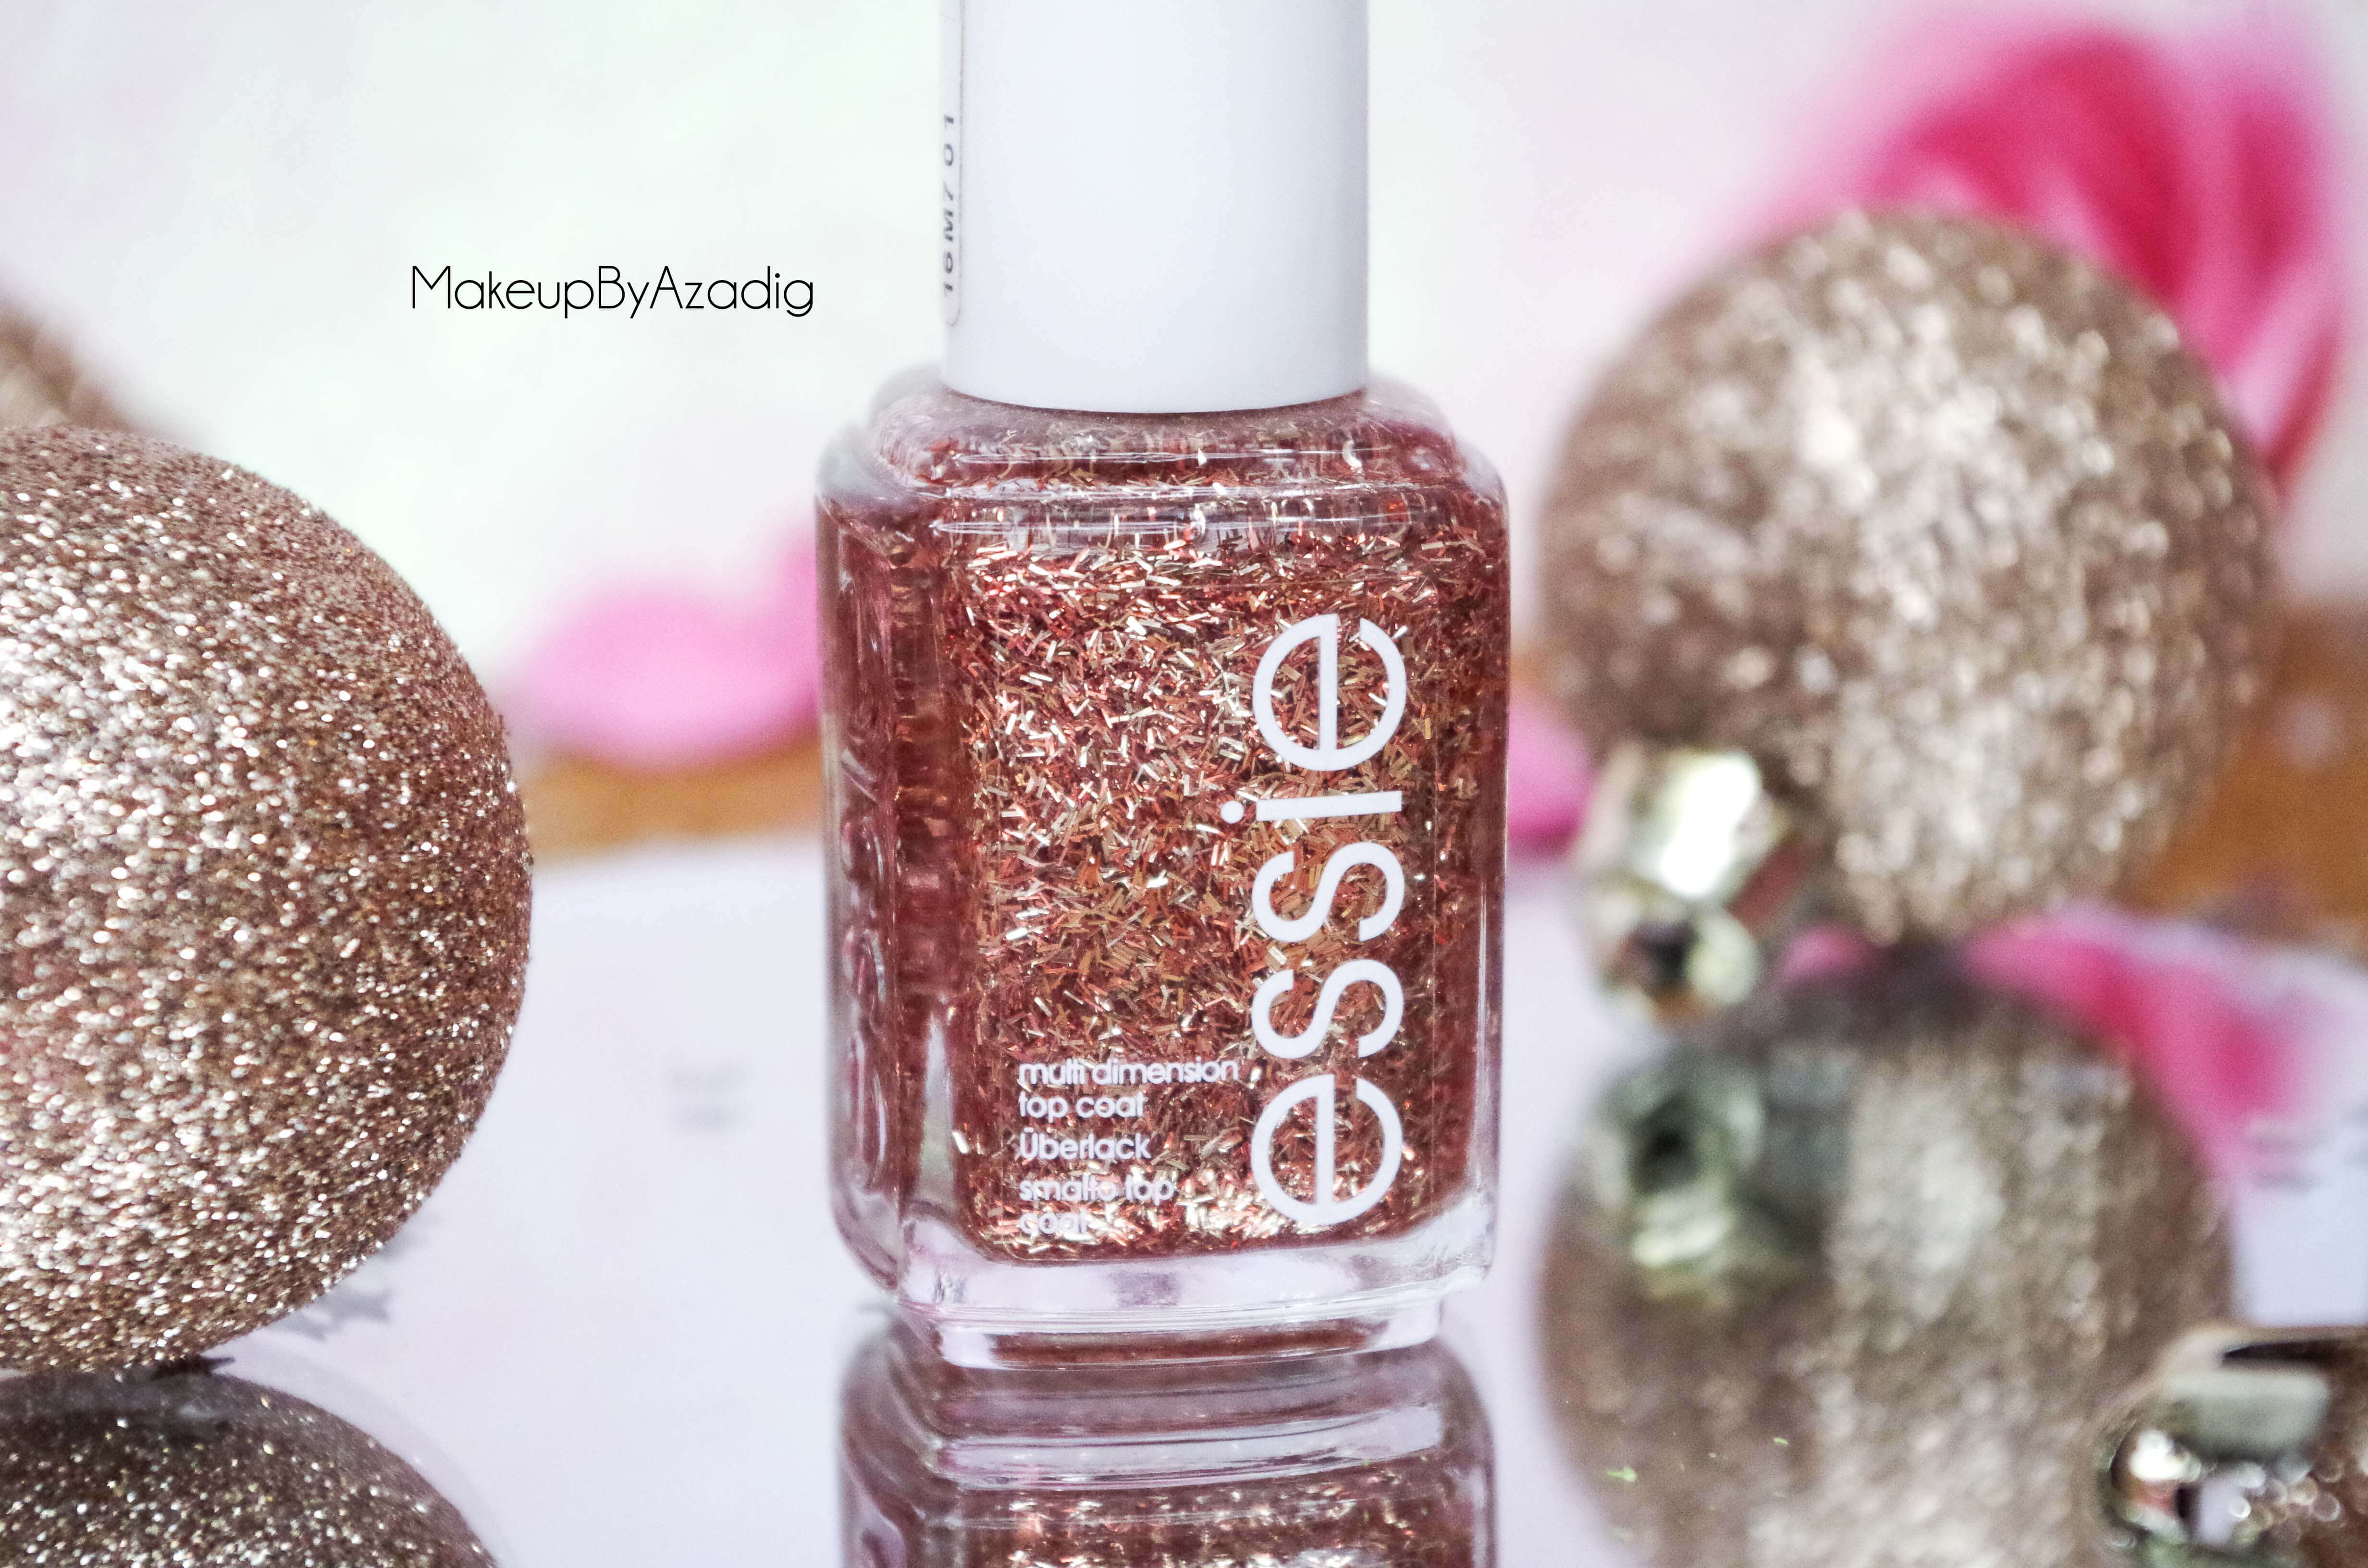 vernis-paillettes-tassel-shaker-accent-nails-essie-sephora-kiko-adopt-sandrea26france-makeupbyazadig